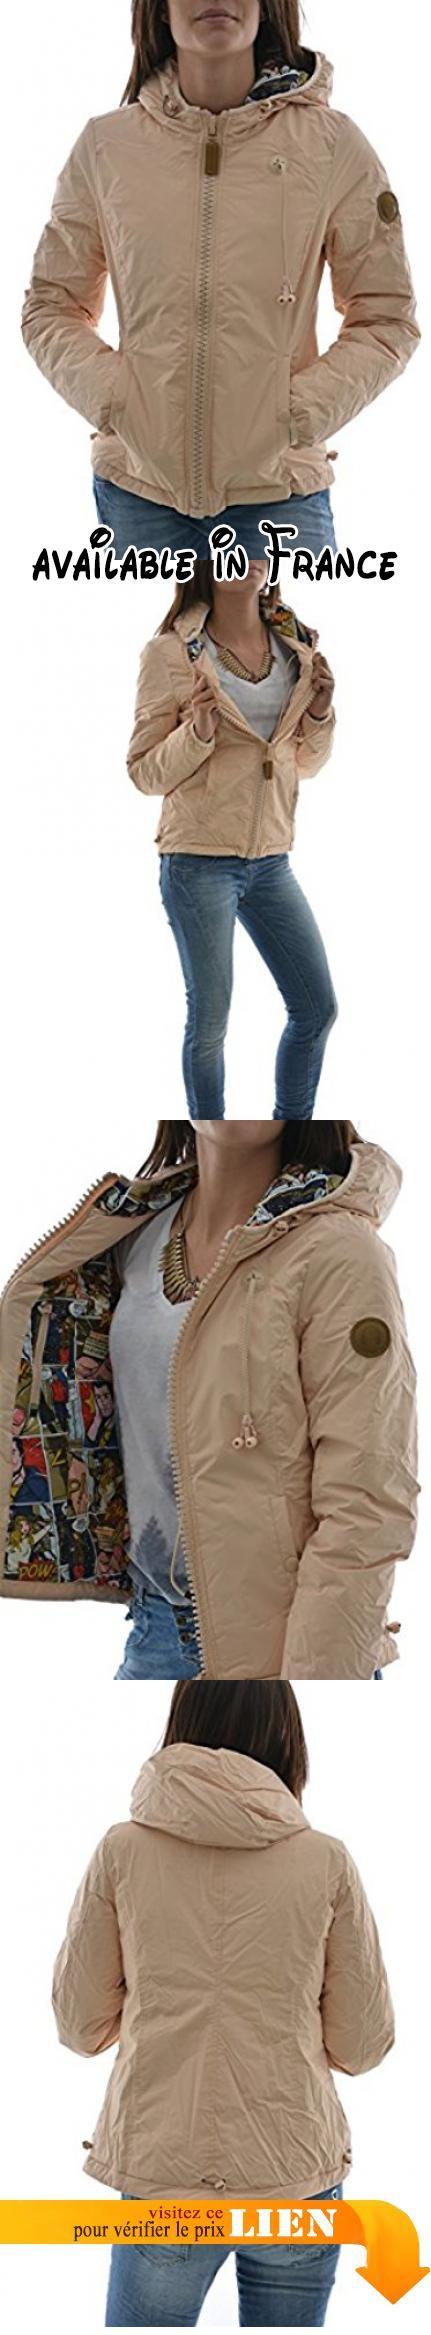 Blousons Original Db Braxton 80 Vestes Xs blazer apparel Et Rose AdxqvRWp